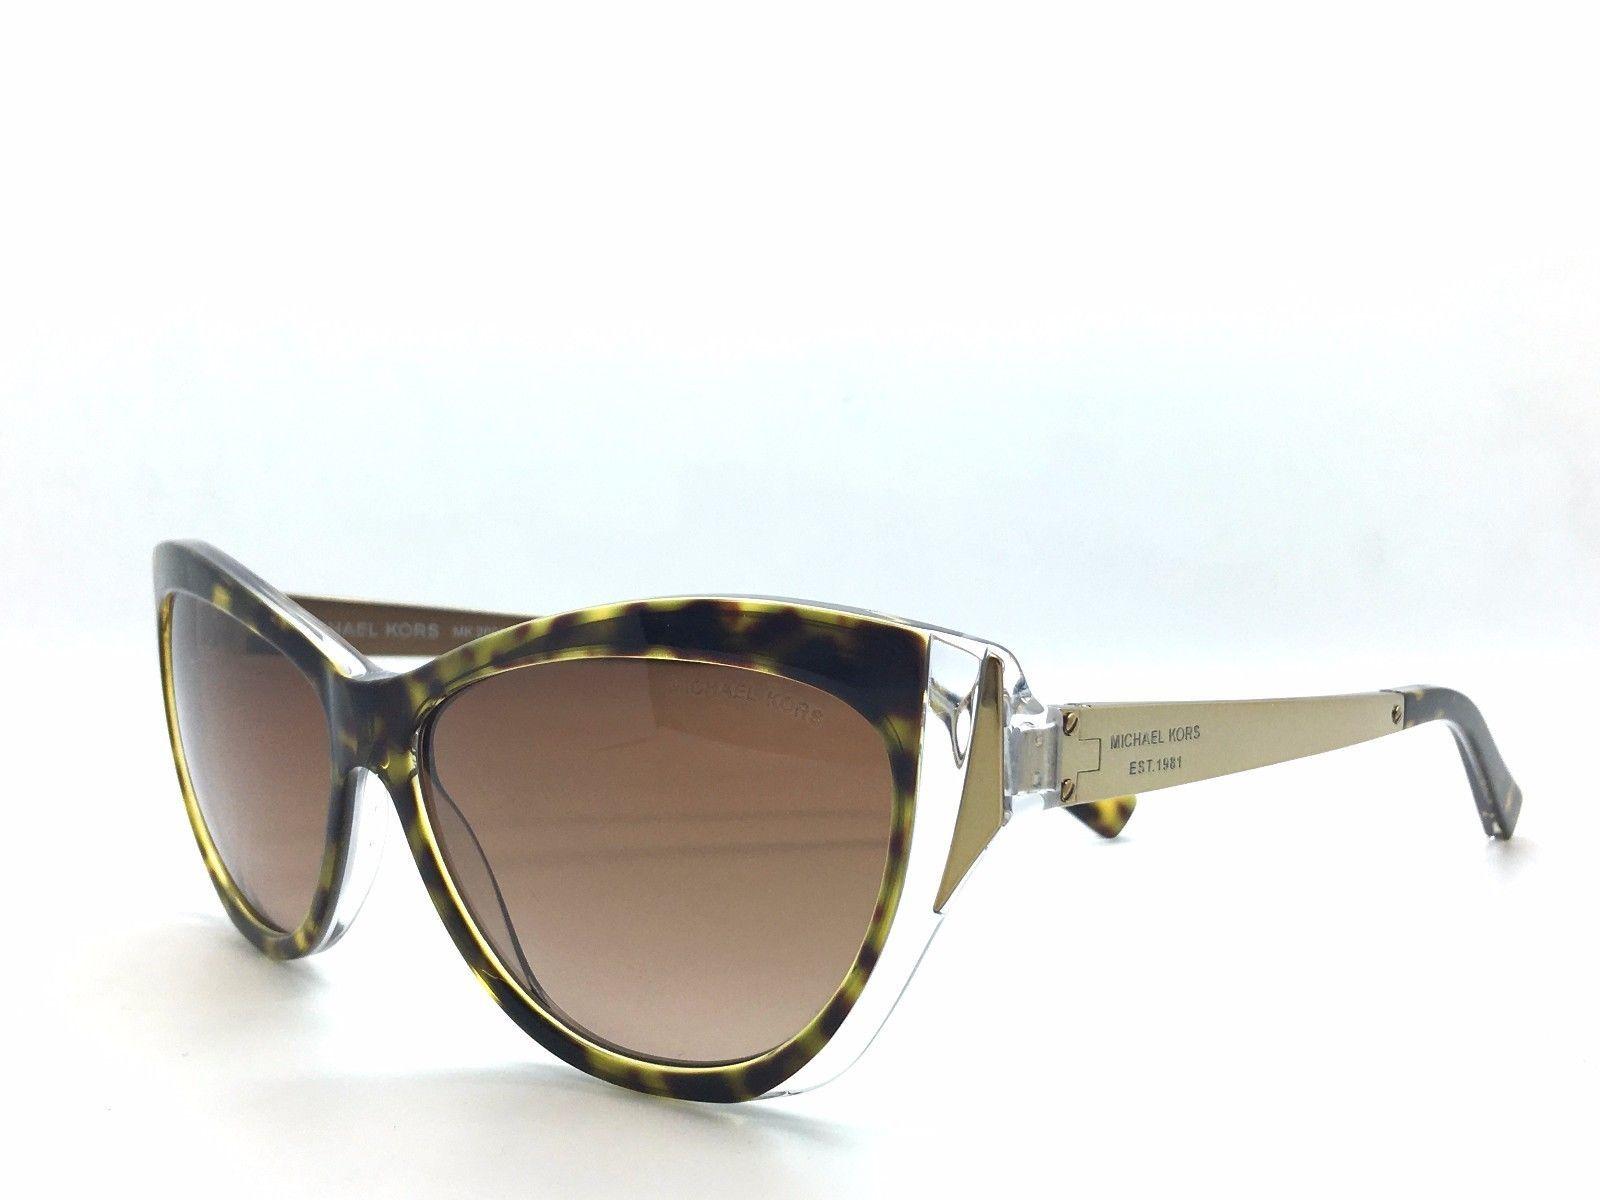 a7120fd064d36 57. 57. Previous. Michael Kors MK 2005 303413 Caneel Tortoise Crystal New  Authentic Sunglasses · Michael ...